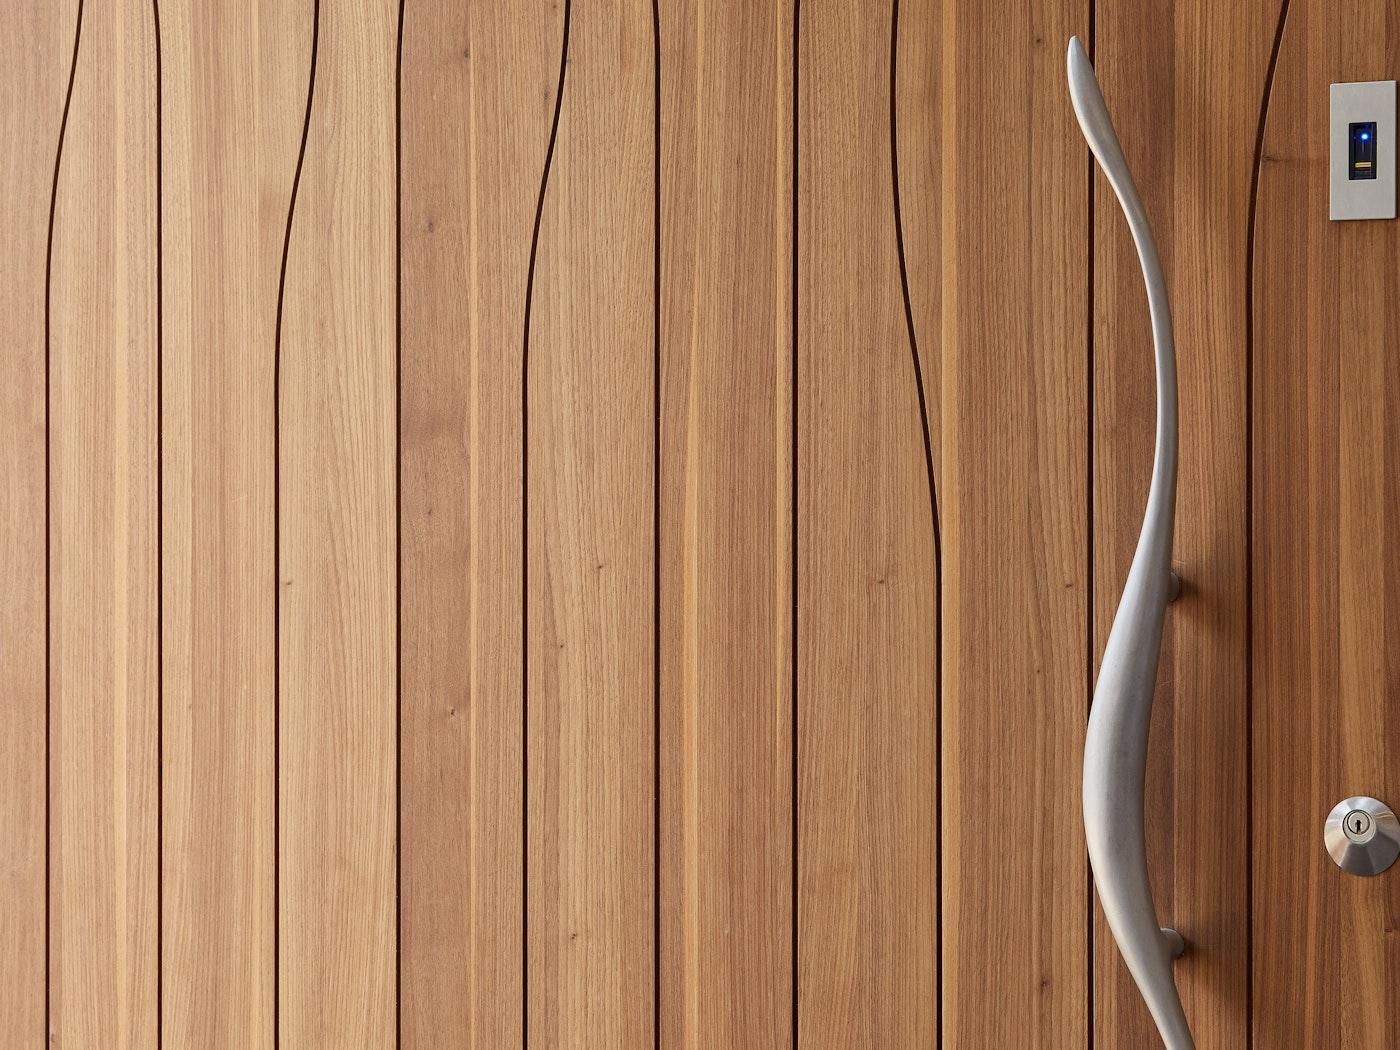 Walnut wavii close up with wave handle